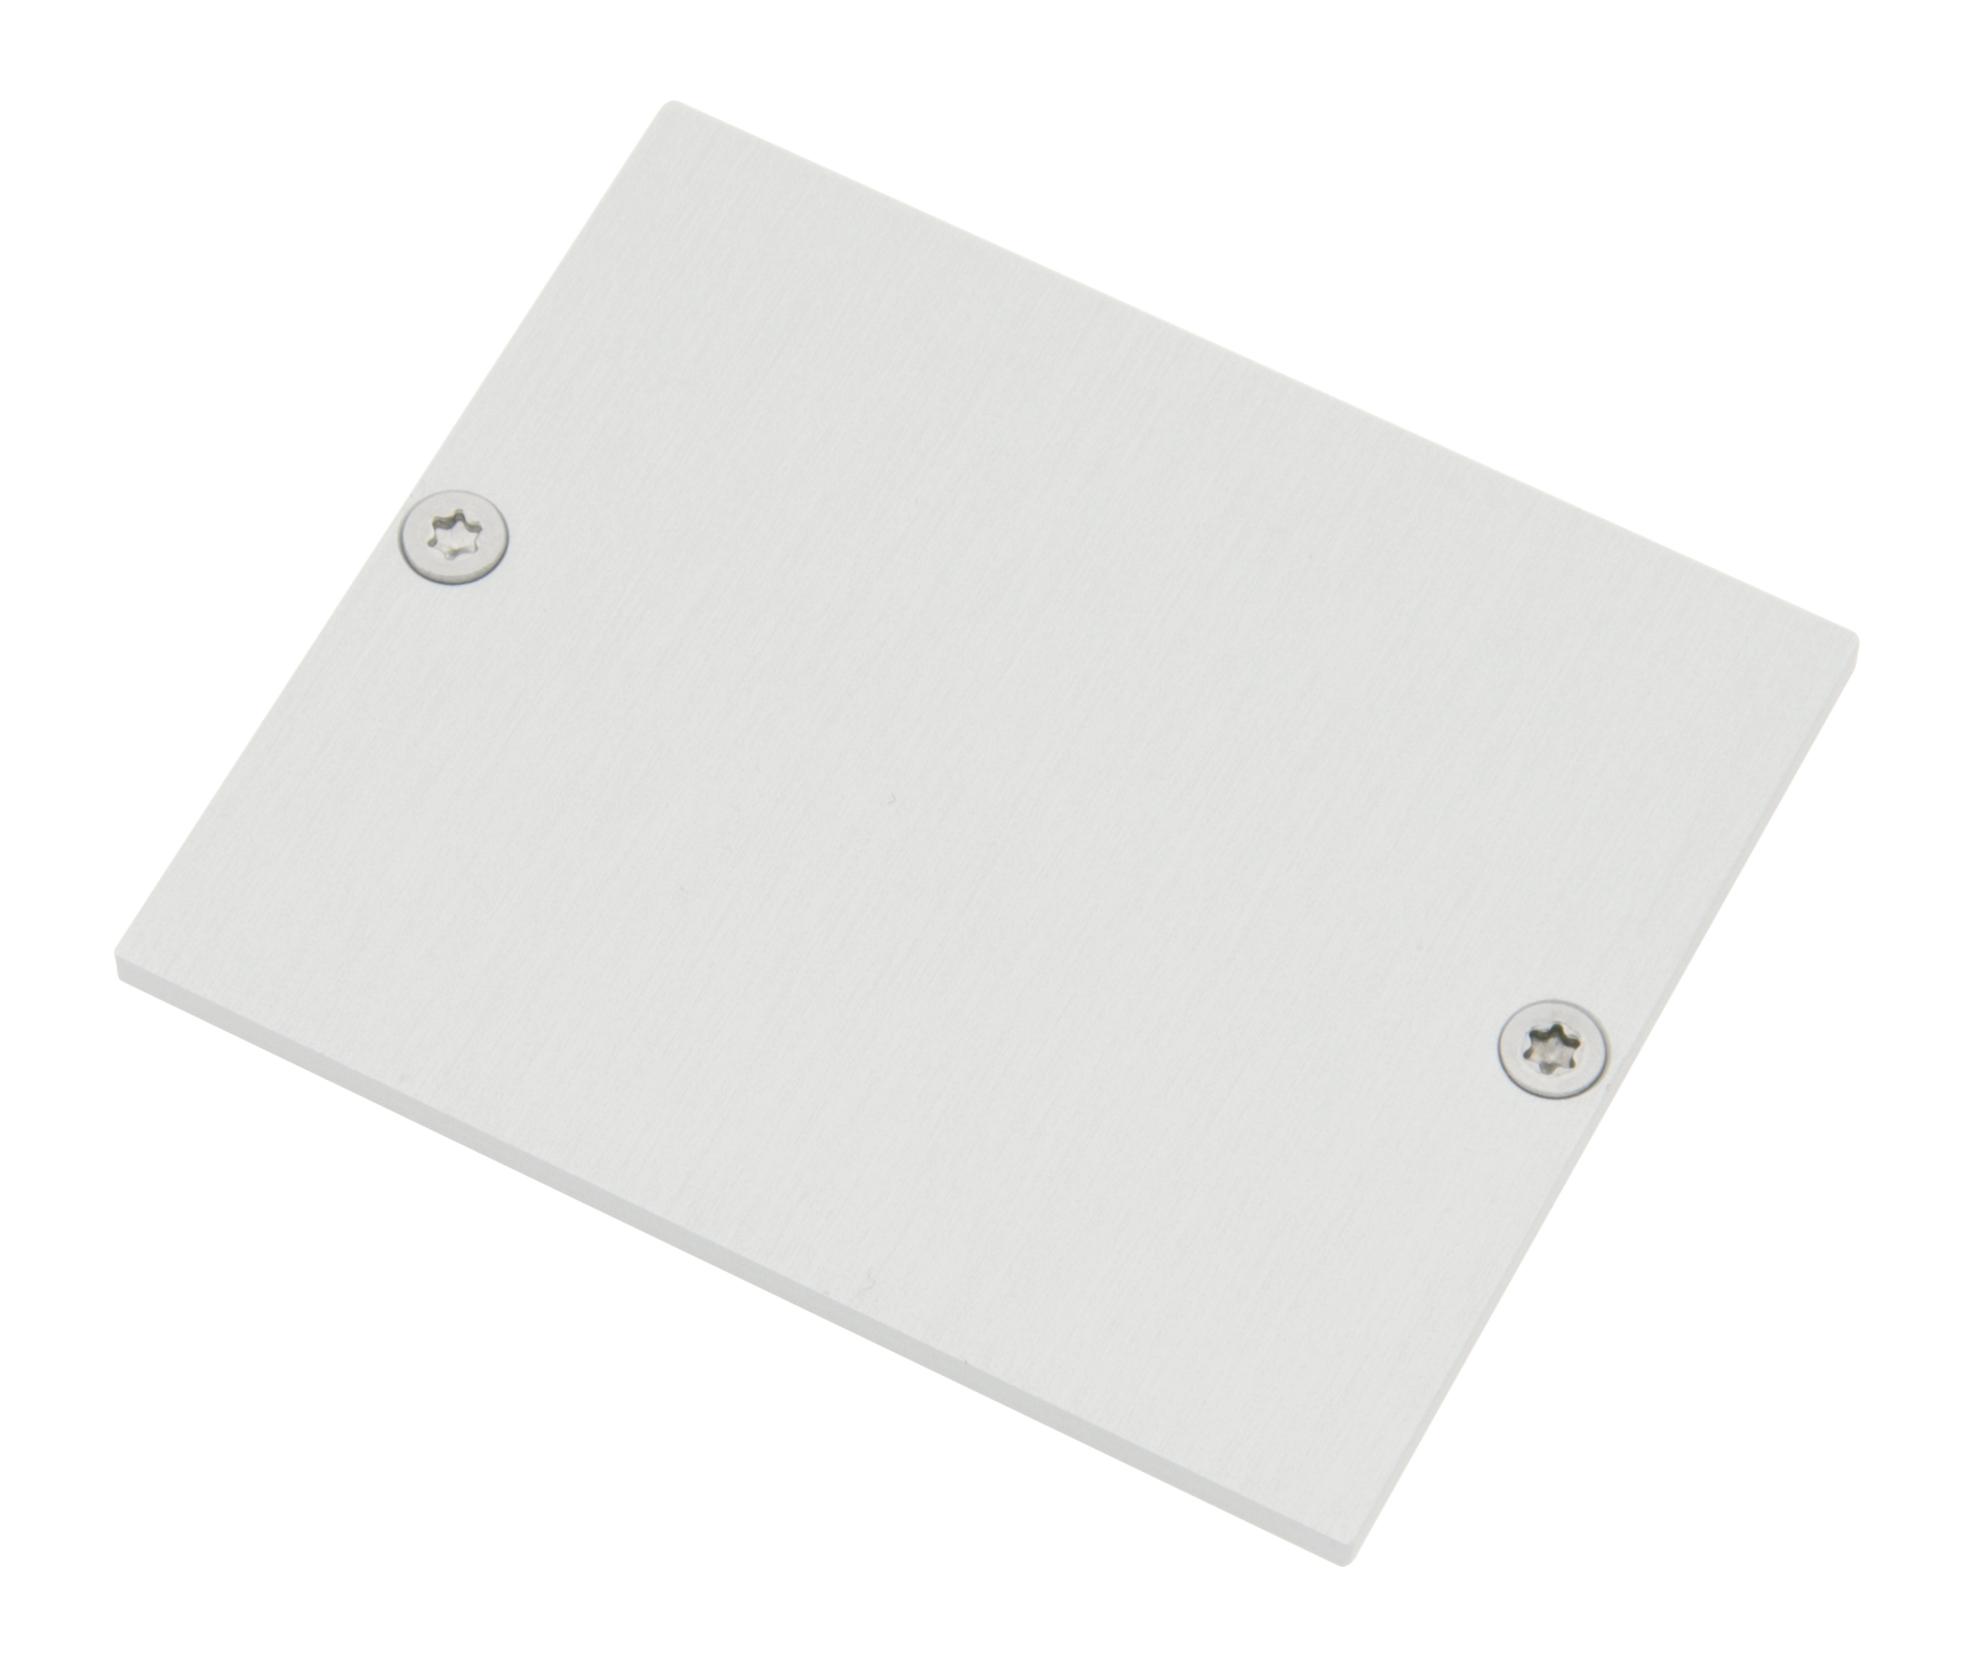 1 Stk Profil Endkappe SLR LIEK003100